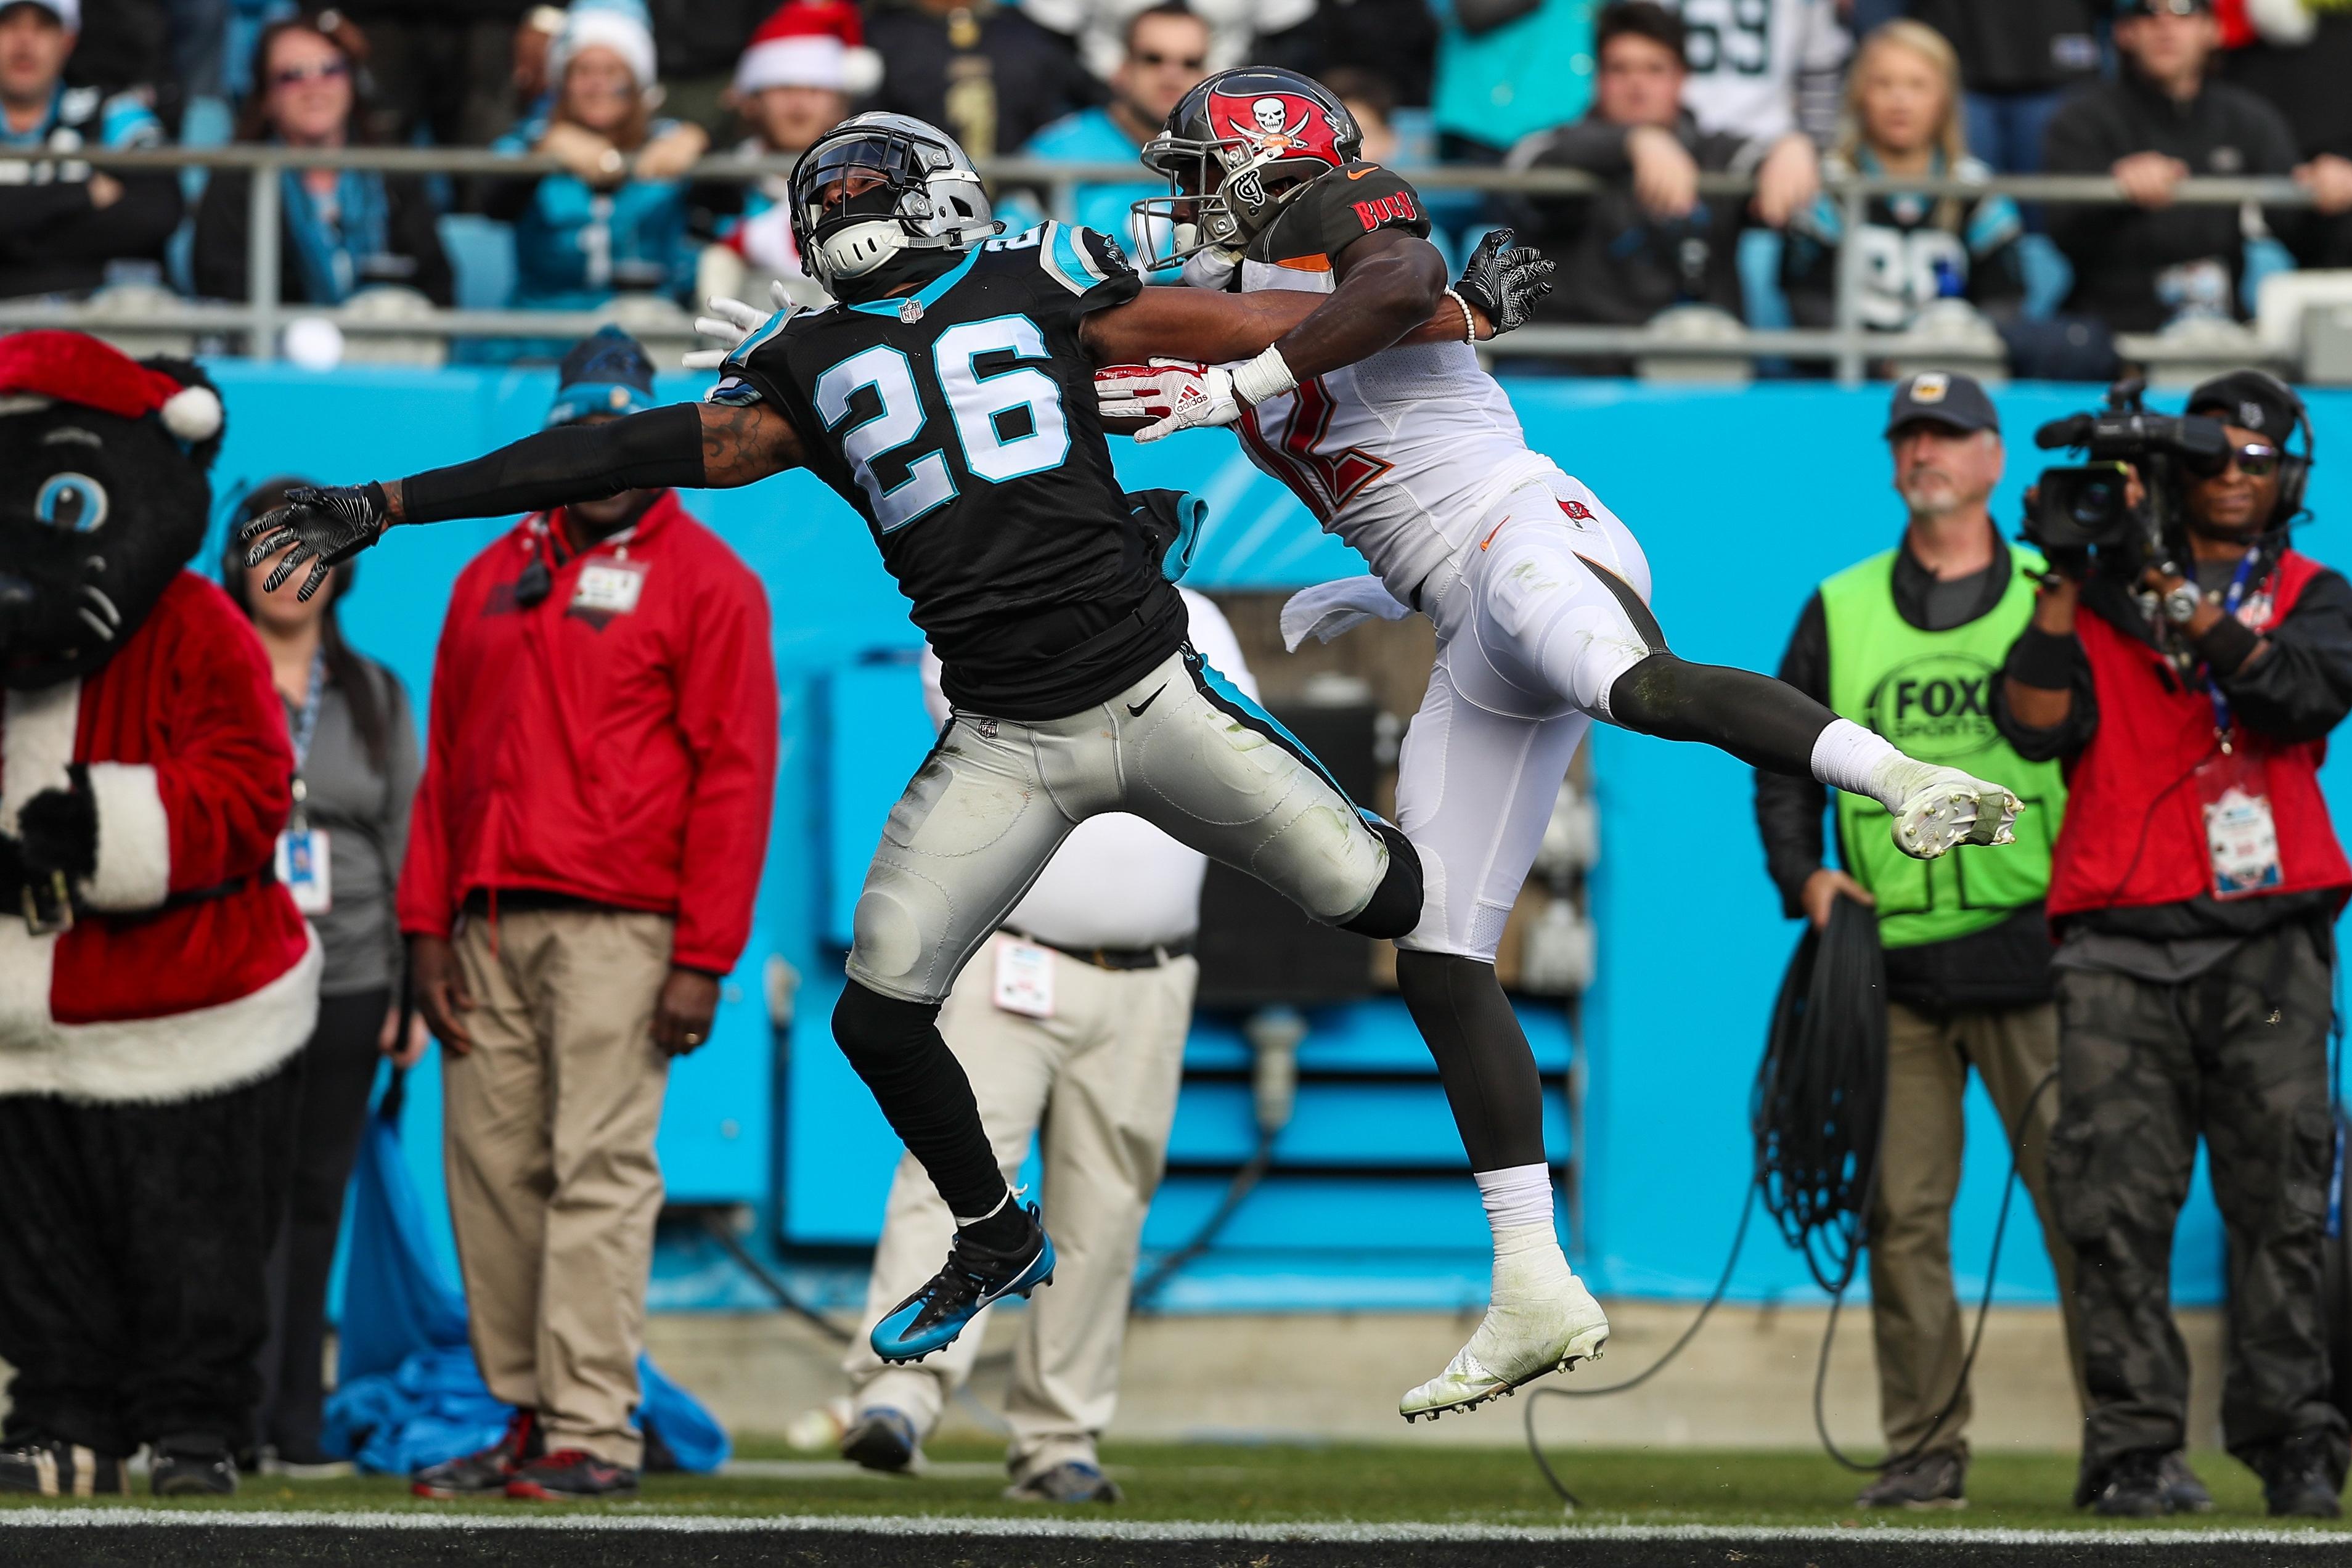 NFL: DEC 24 Buccaneers at Panthers